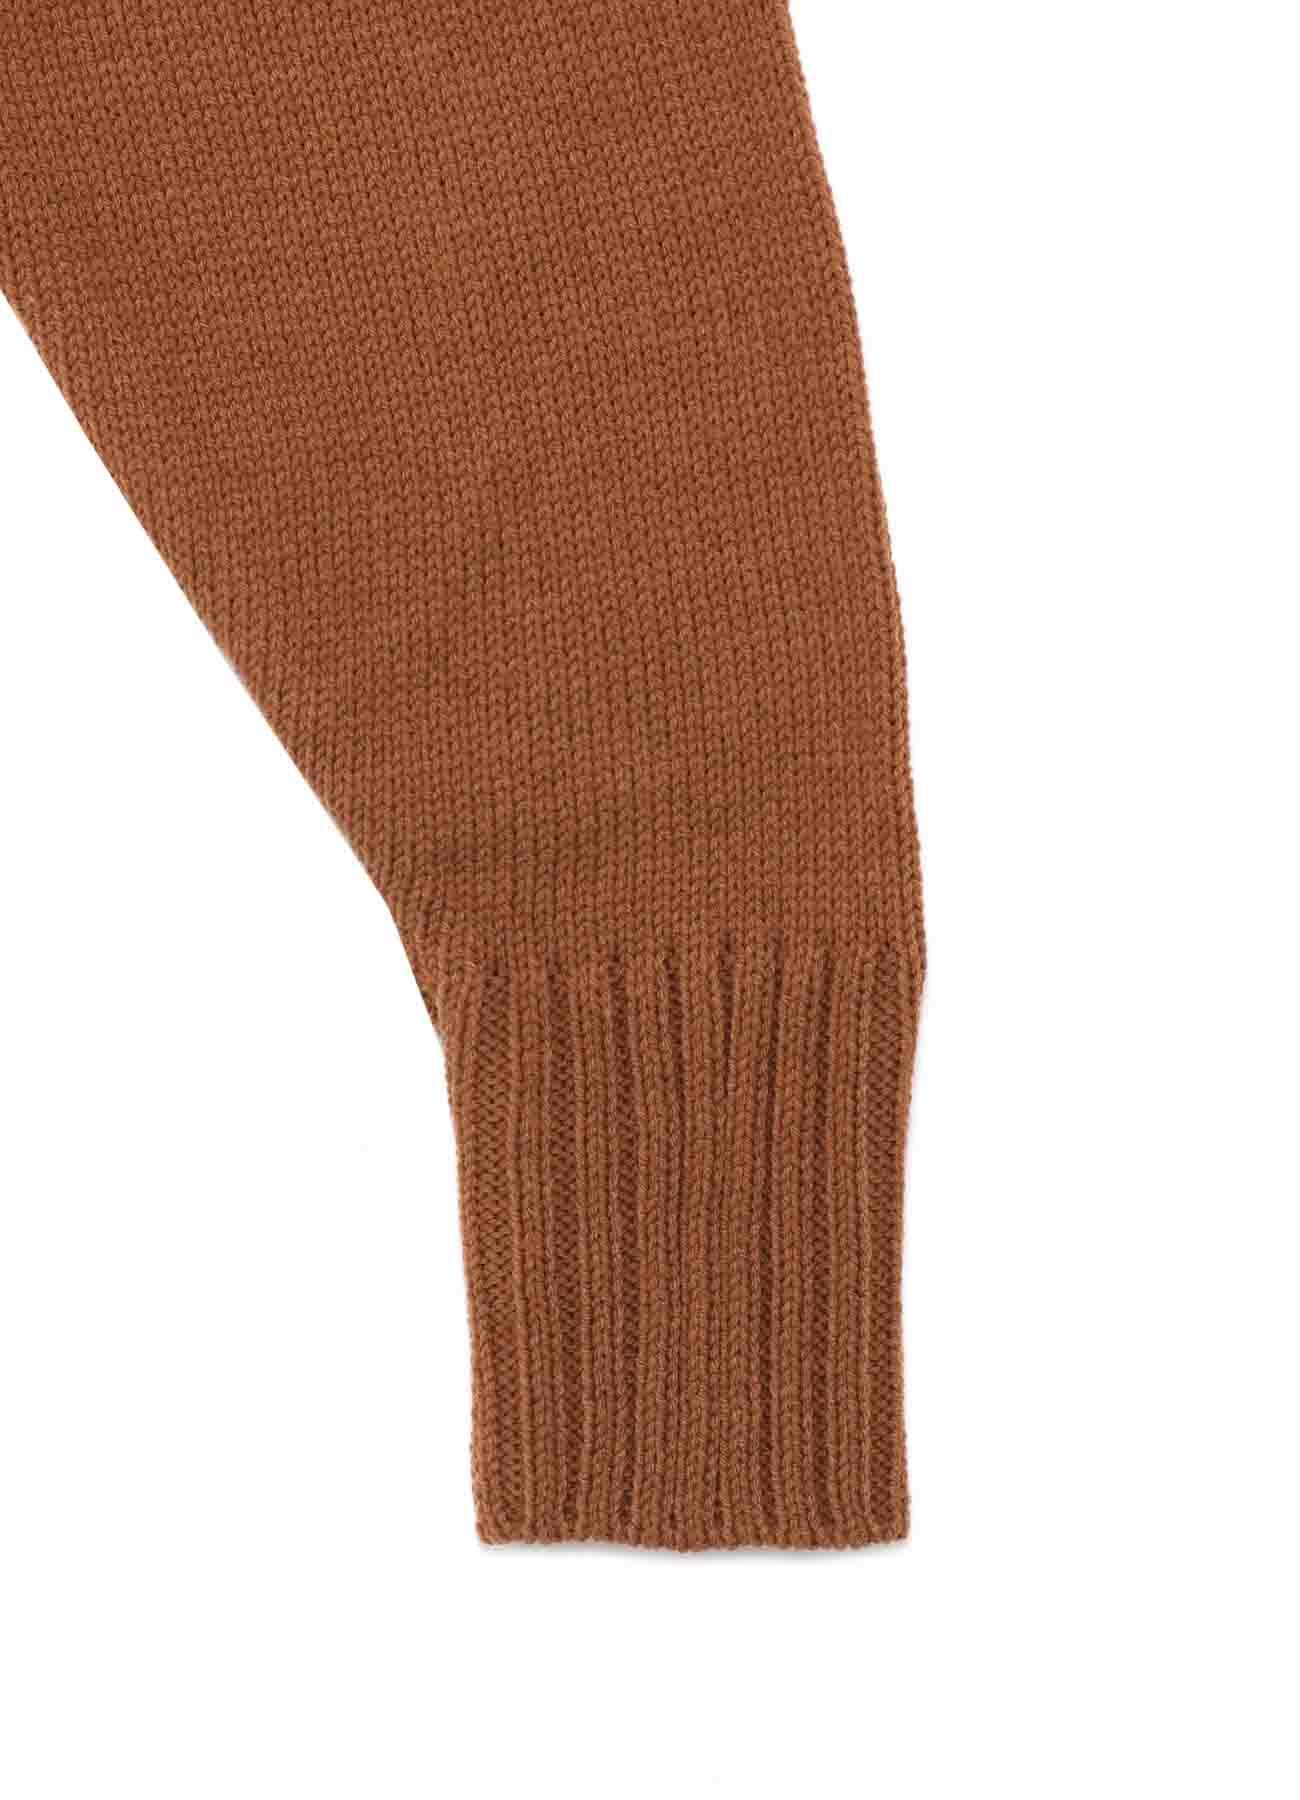 C/Capri Cord Slash Turtle Neck Knit